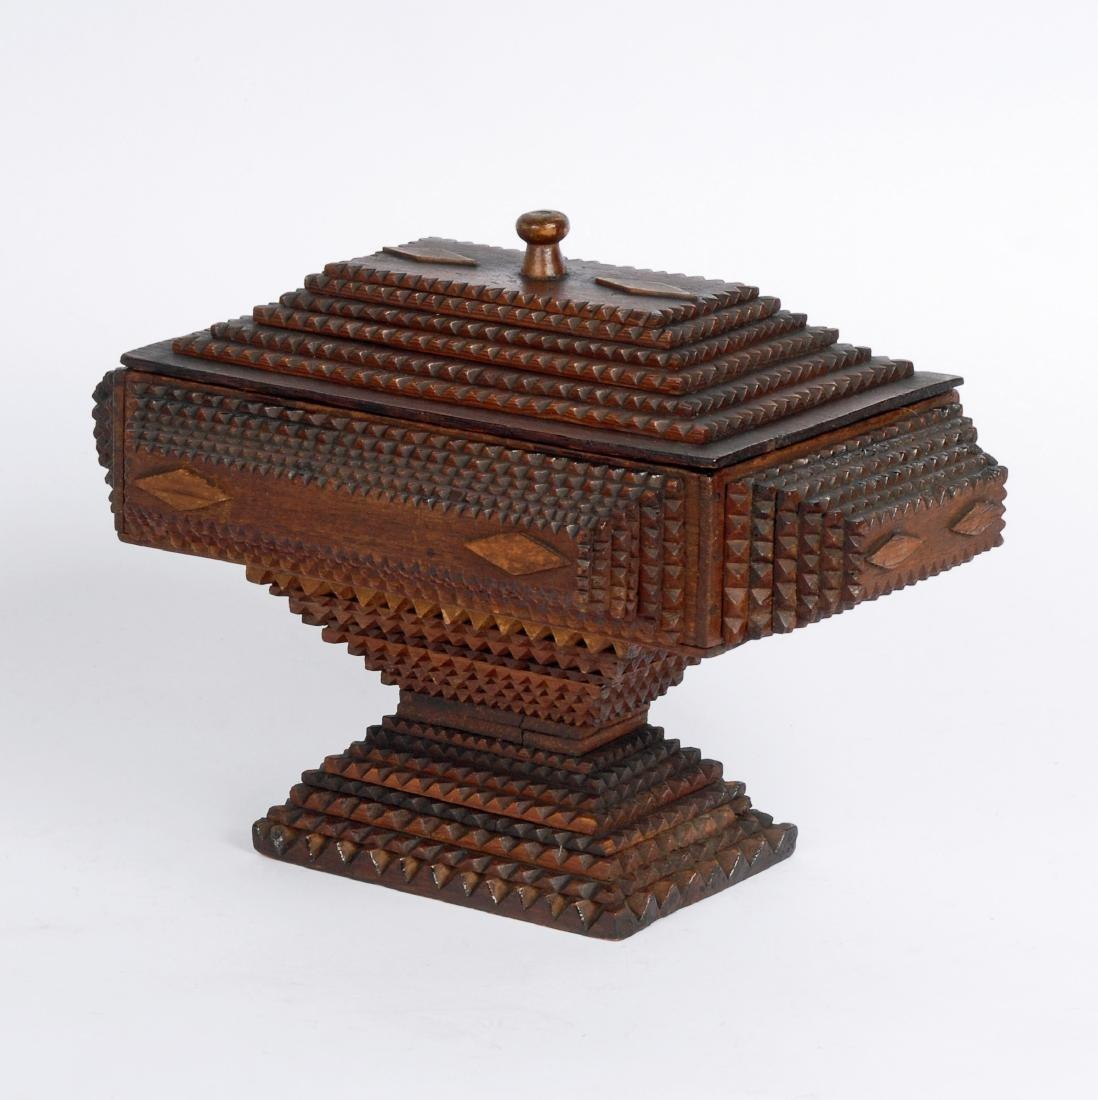 Dated 1893 Tramp Art Box by Civil War Soldier - 2